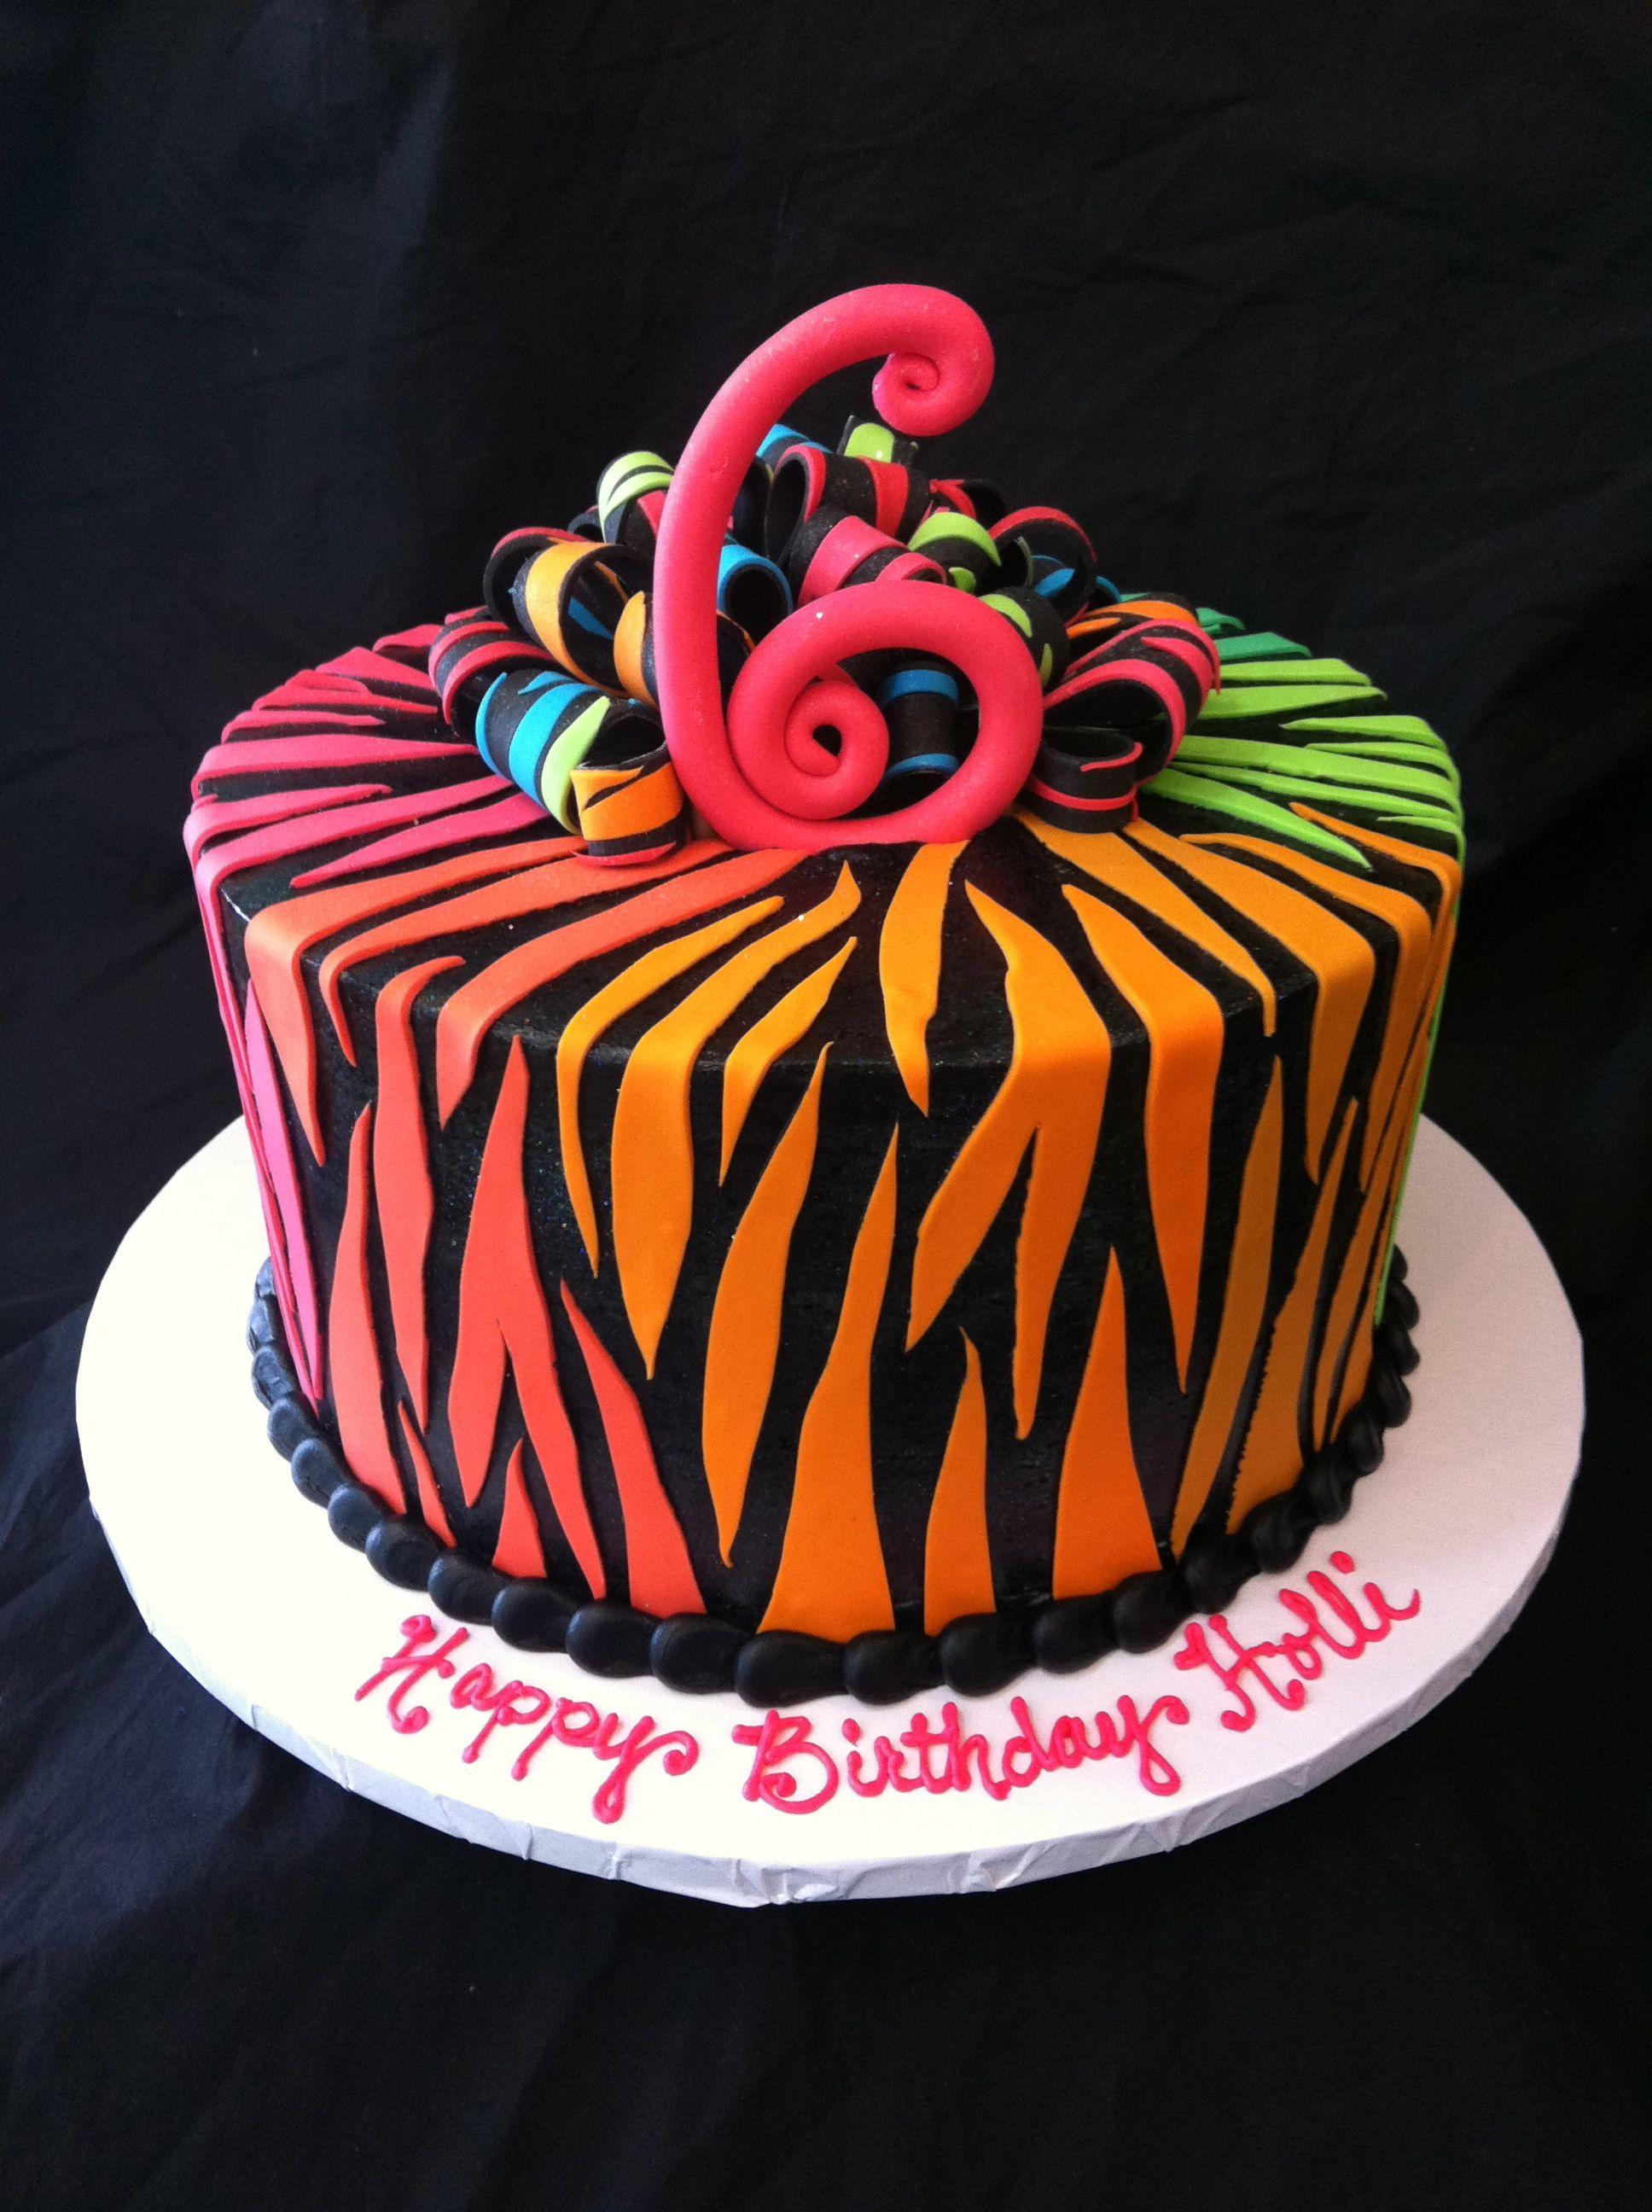 Multicolored zebra print cake Cakes Cakes More Cakes